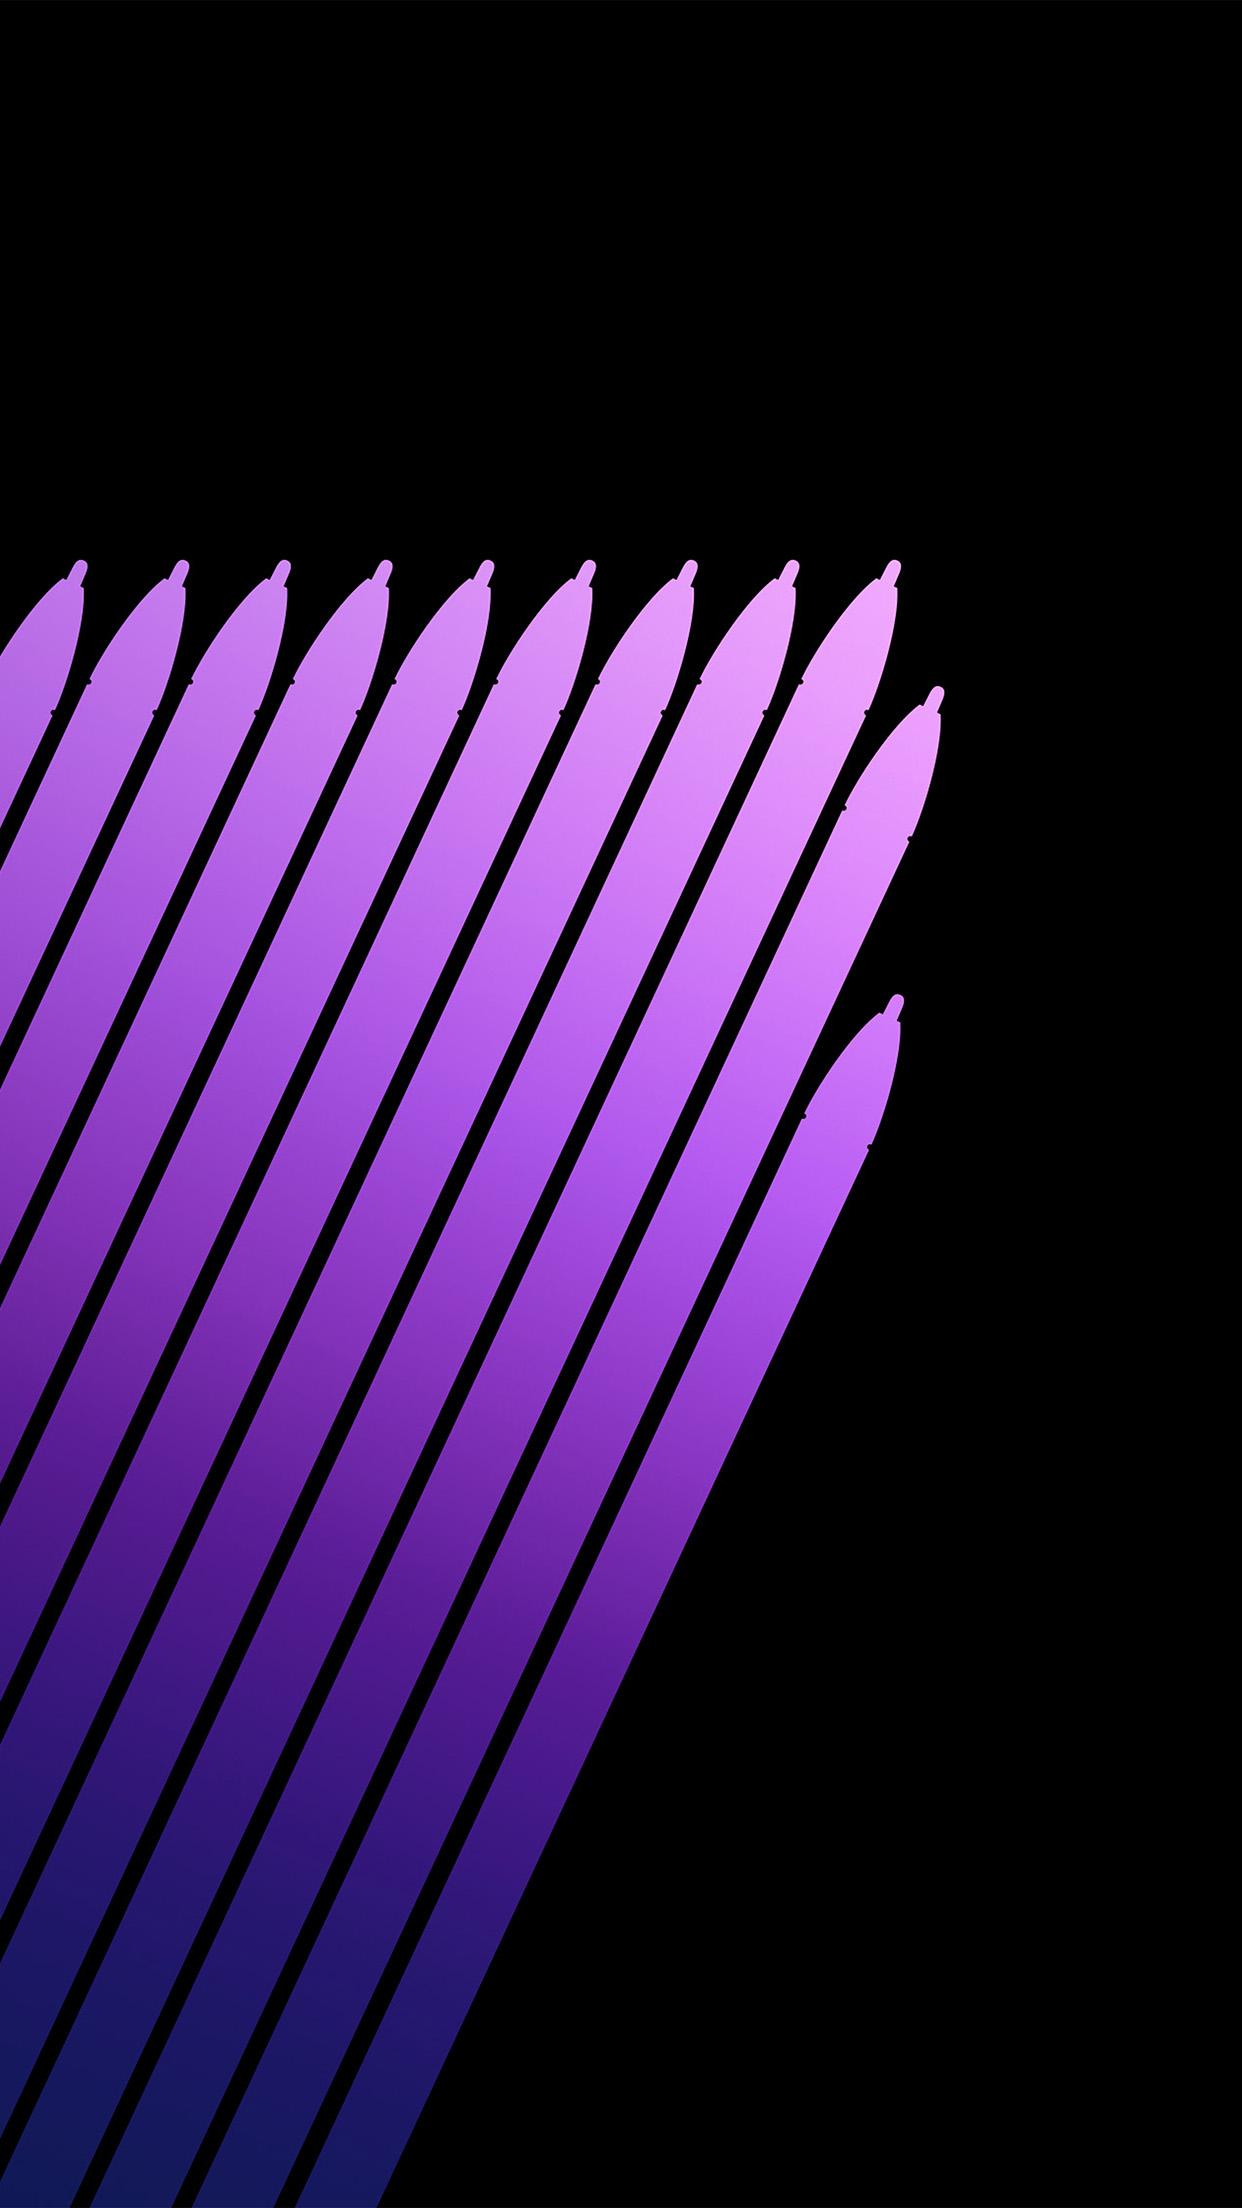 Vq90 Note 7 Galaxy Art Pen Dark Purple Pattern